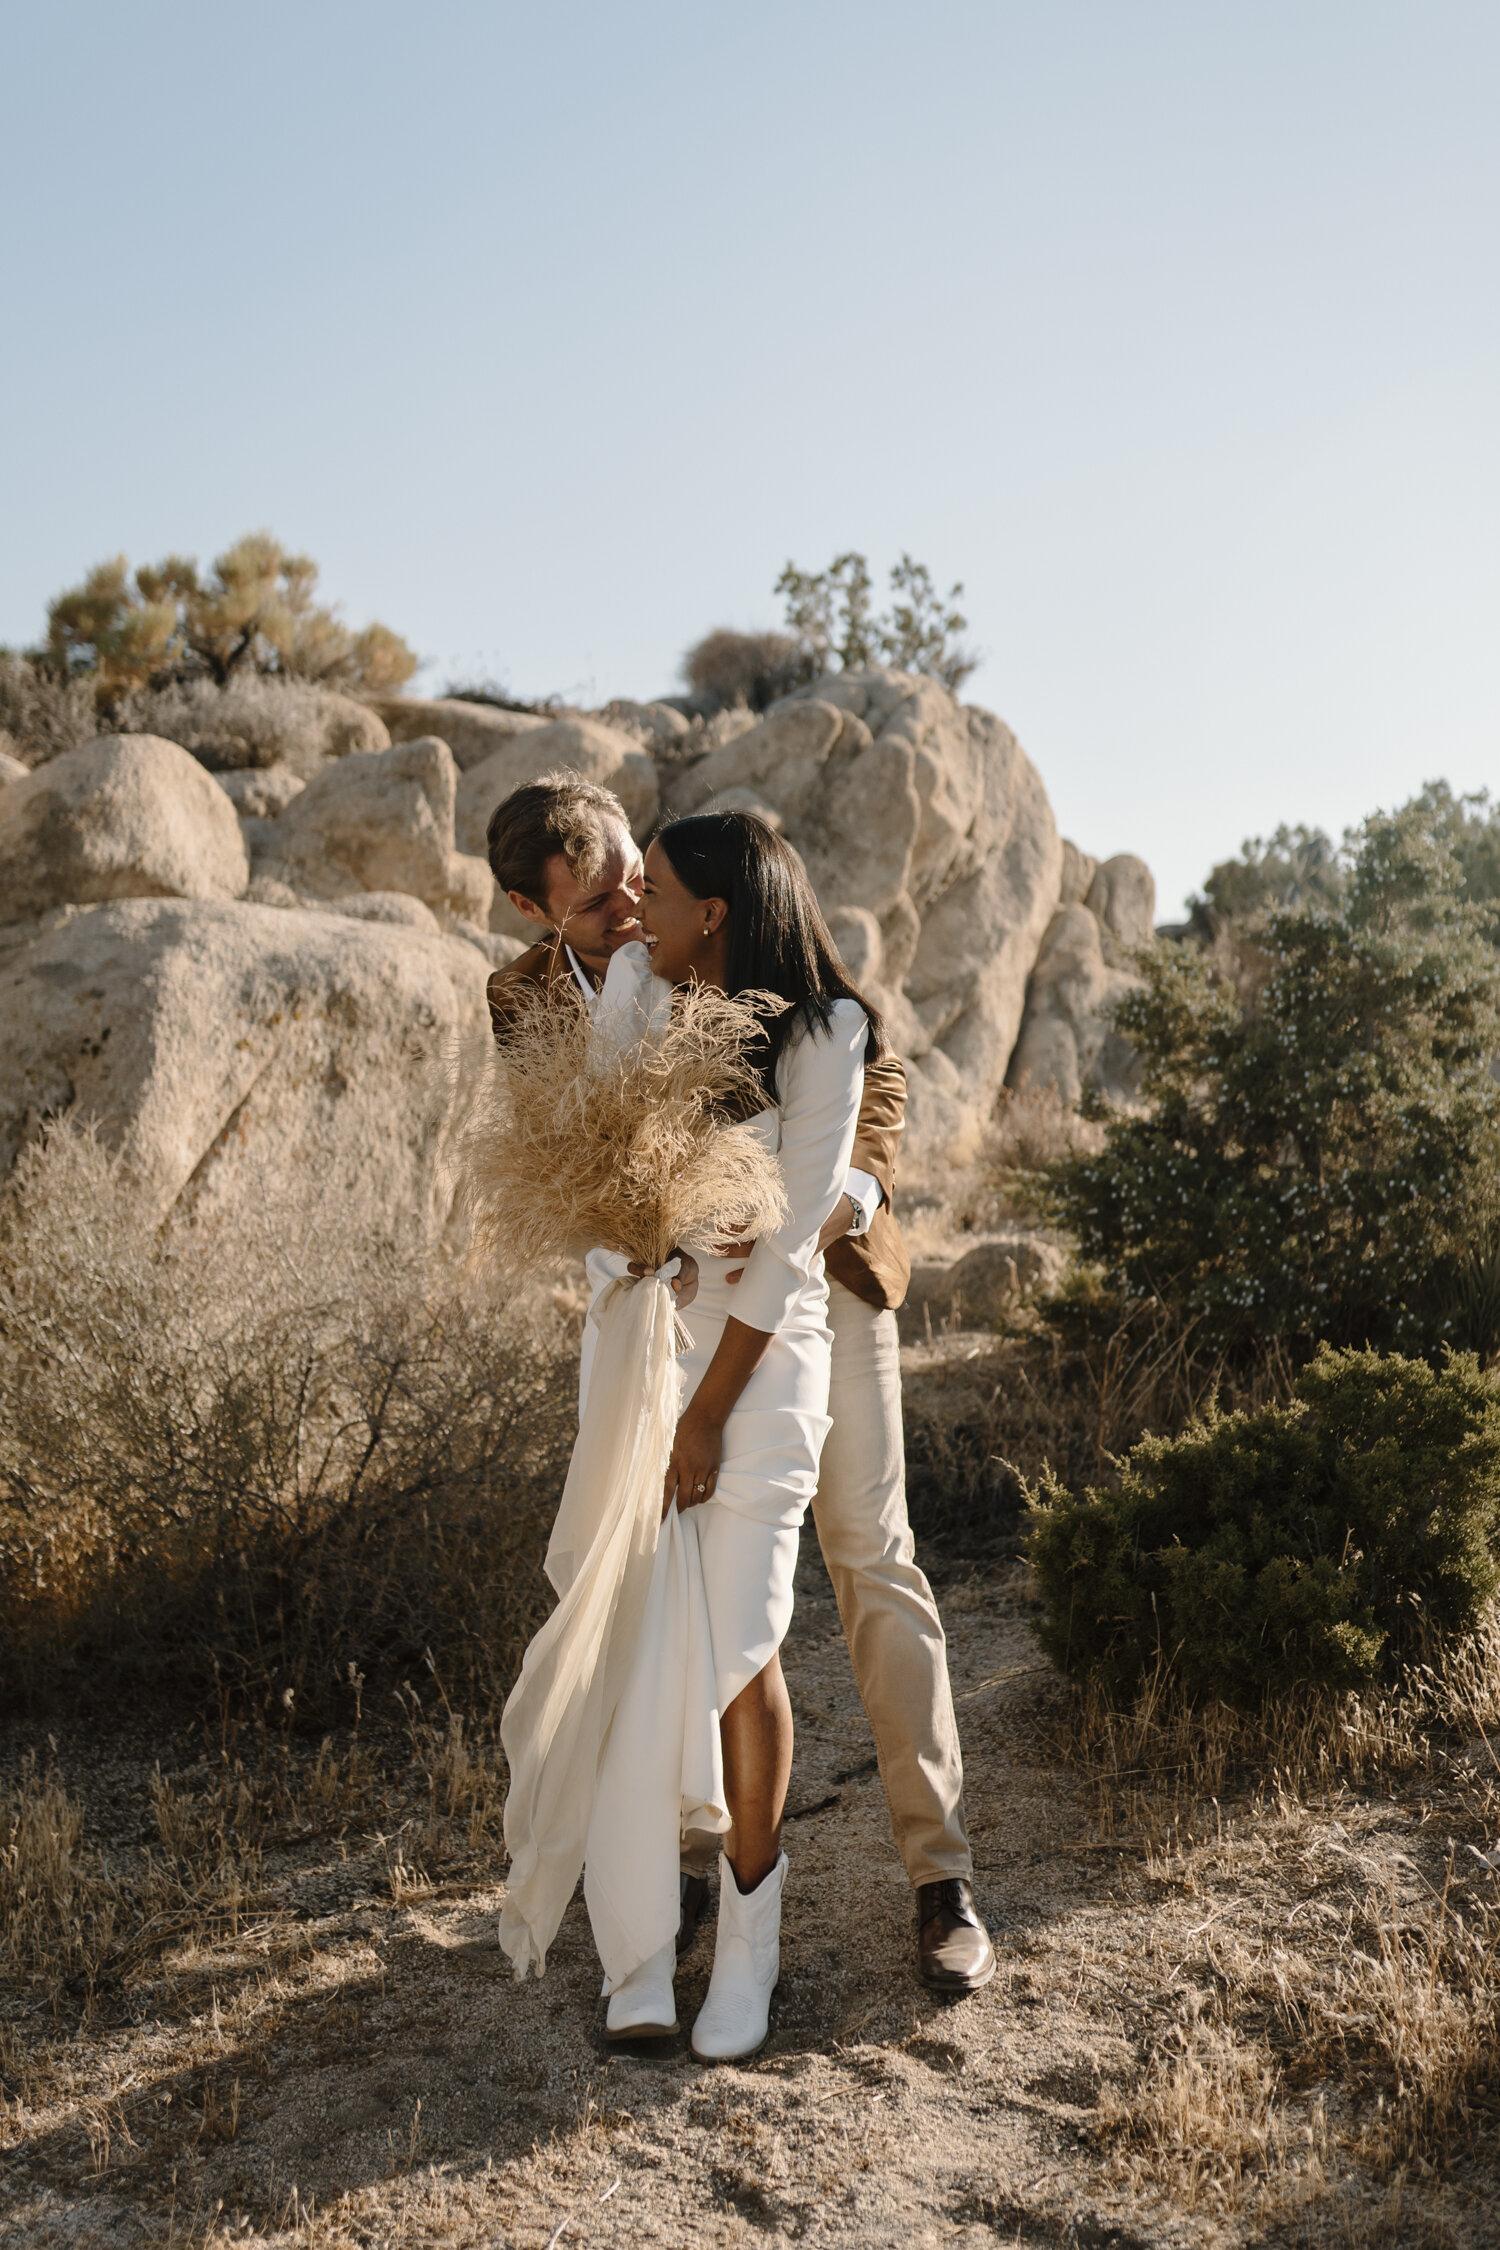 Playful bride and groom portraits by Kayli LaFon Photograhy